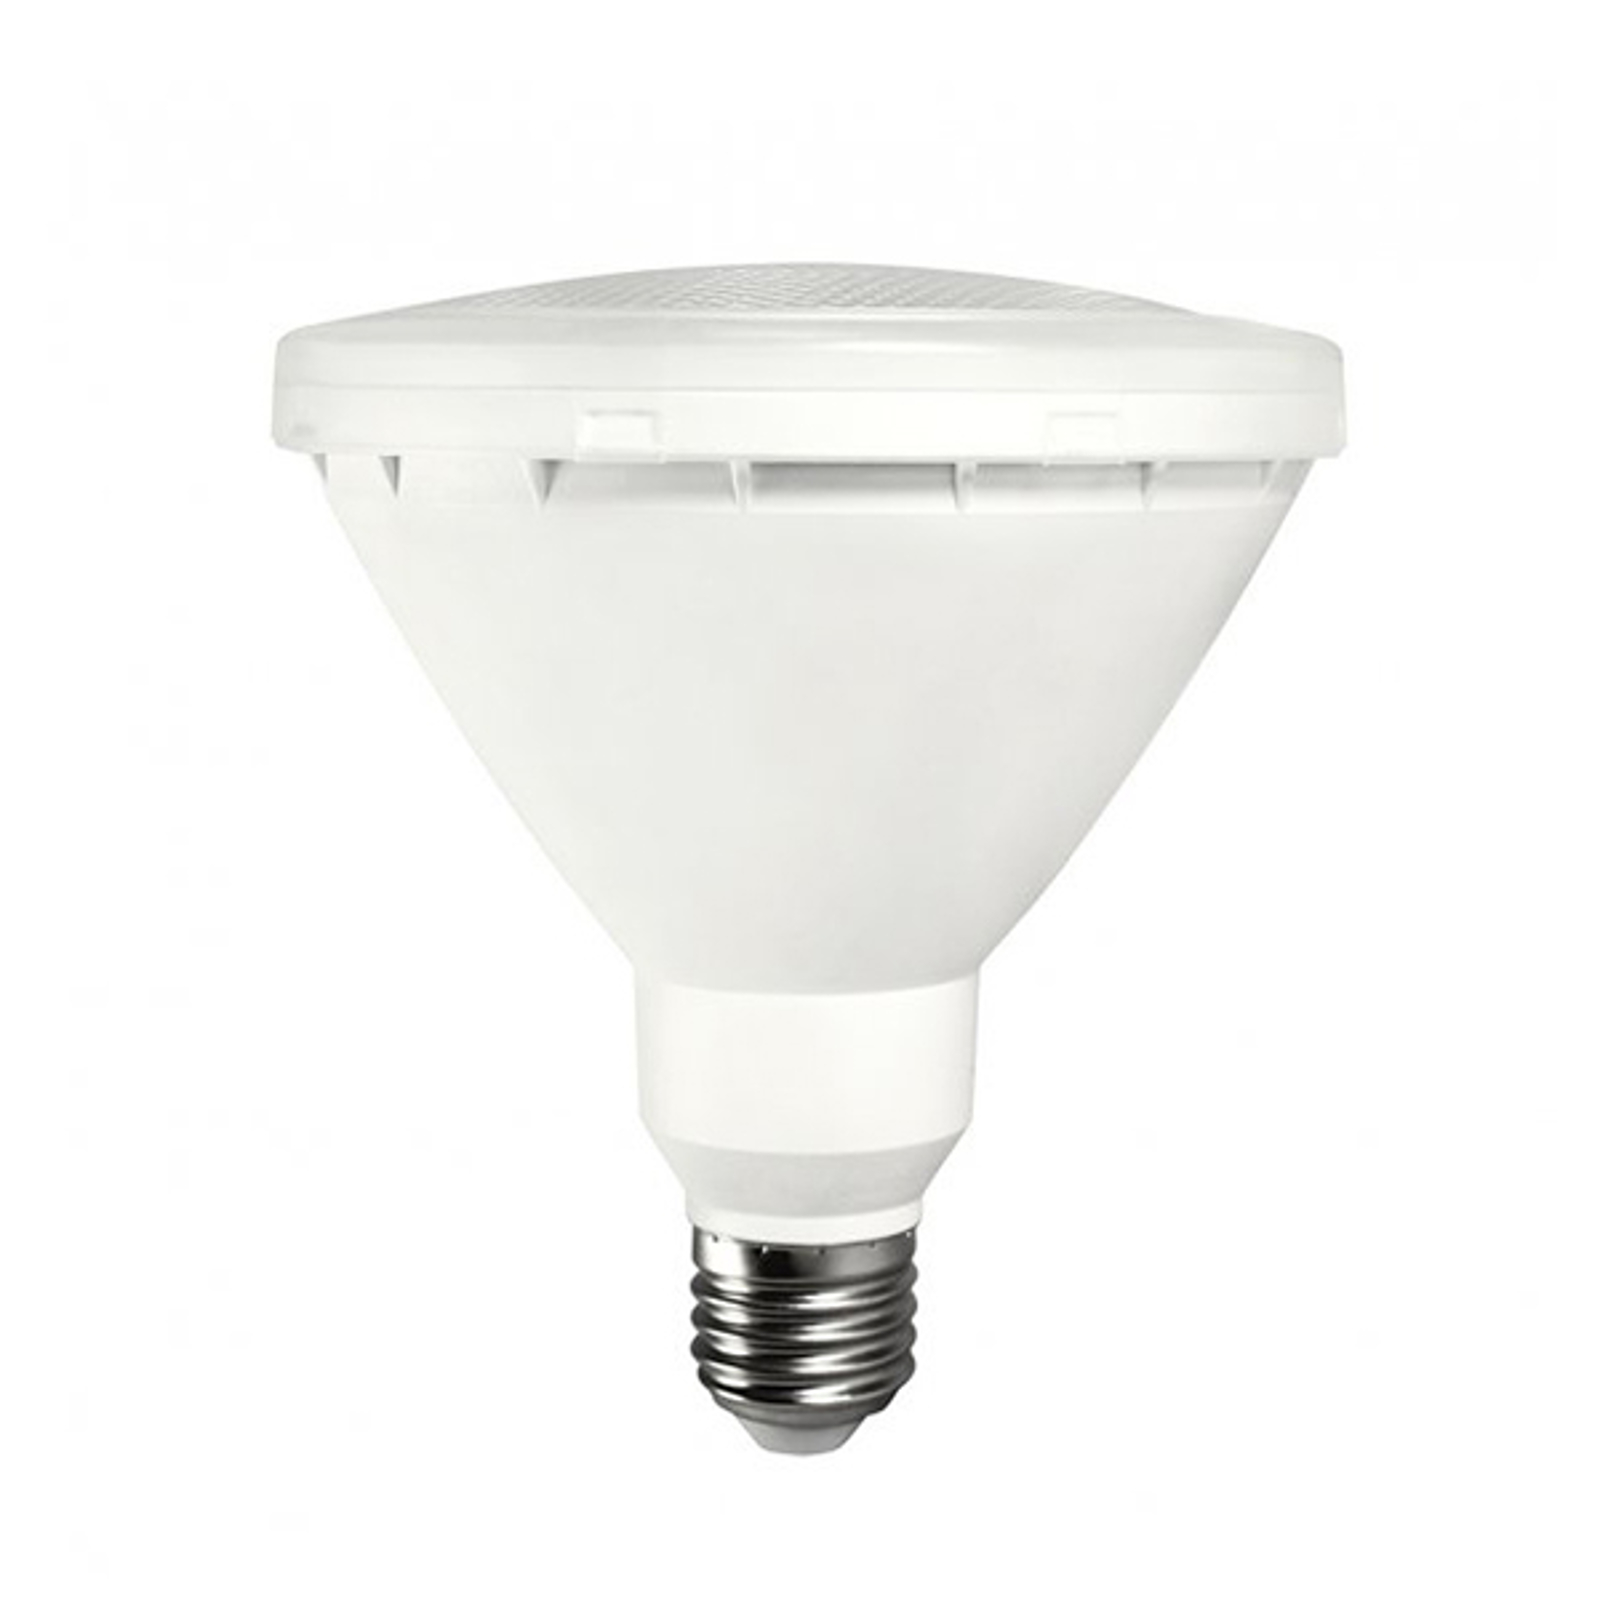 E27 15W 827 LED-Reflektor RODER PAR38 wasserdicht